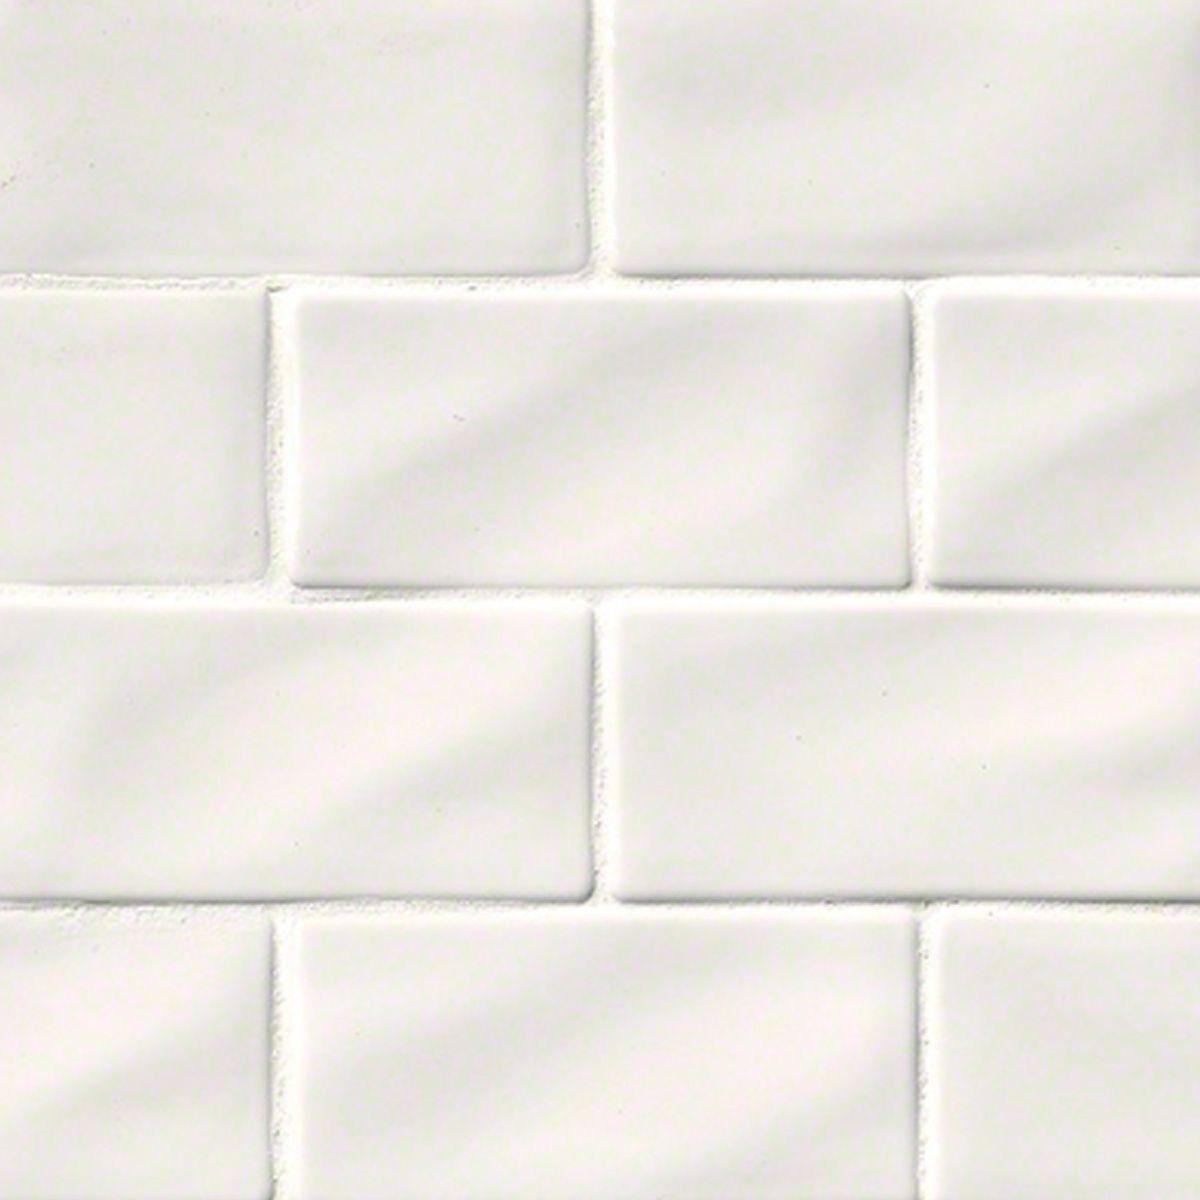 Whisper white glazed handcrafted 3x6 ceramic subway tile beach whisper white glazed handcrafted 3x6 ceramic subway tile dailygadgetfo Image collections